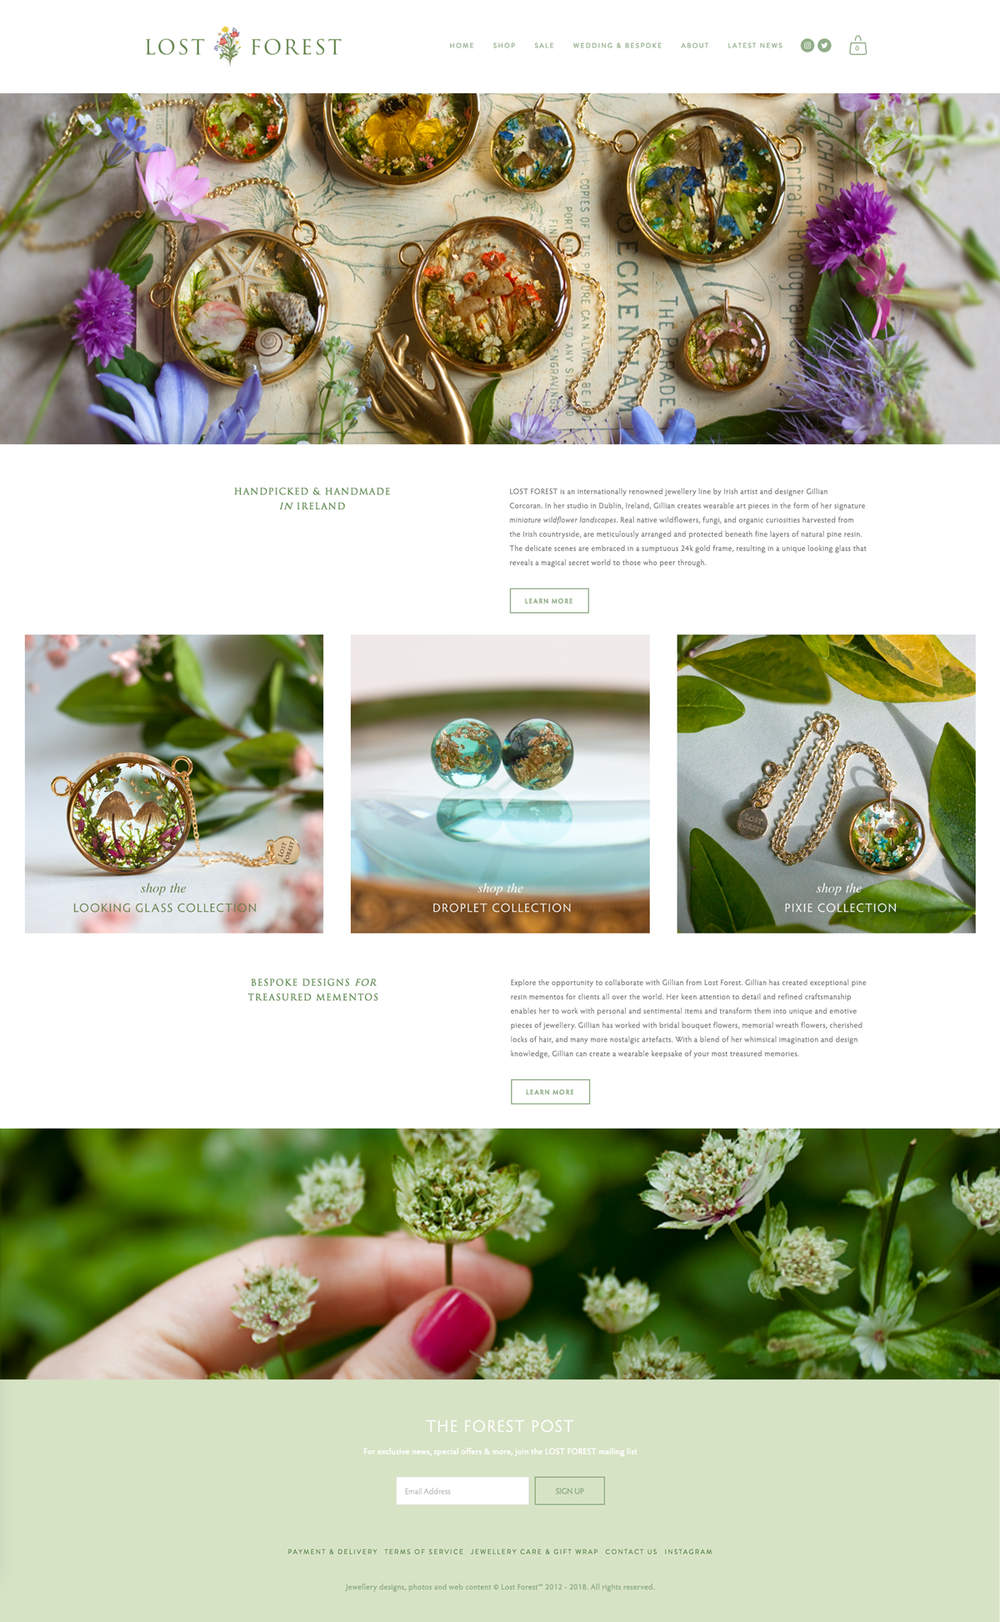 Lost Forest website design by Rachel Corcoran